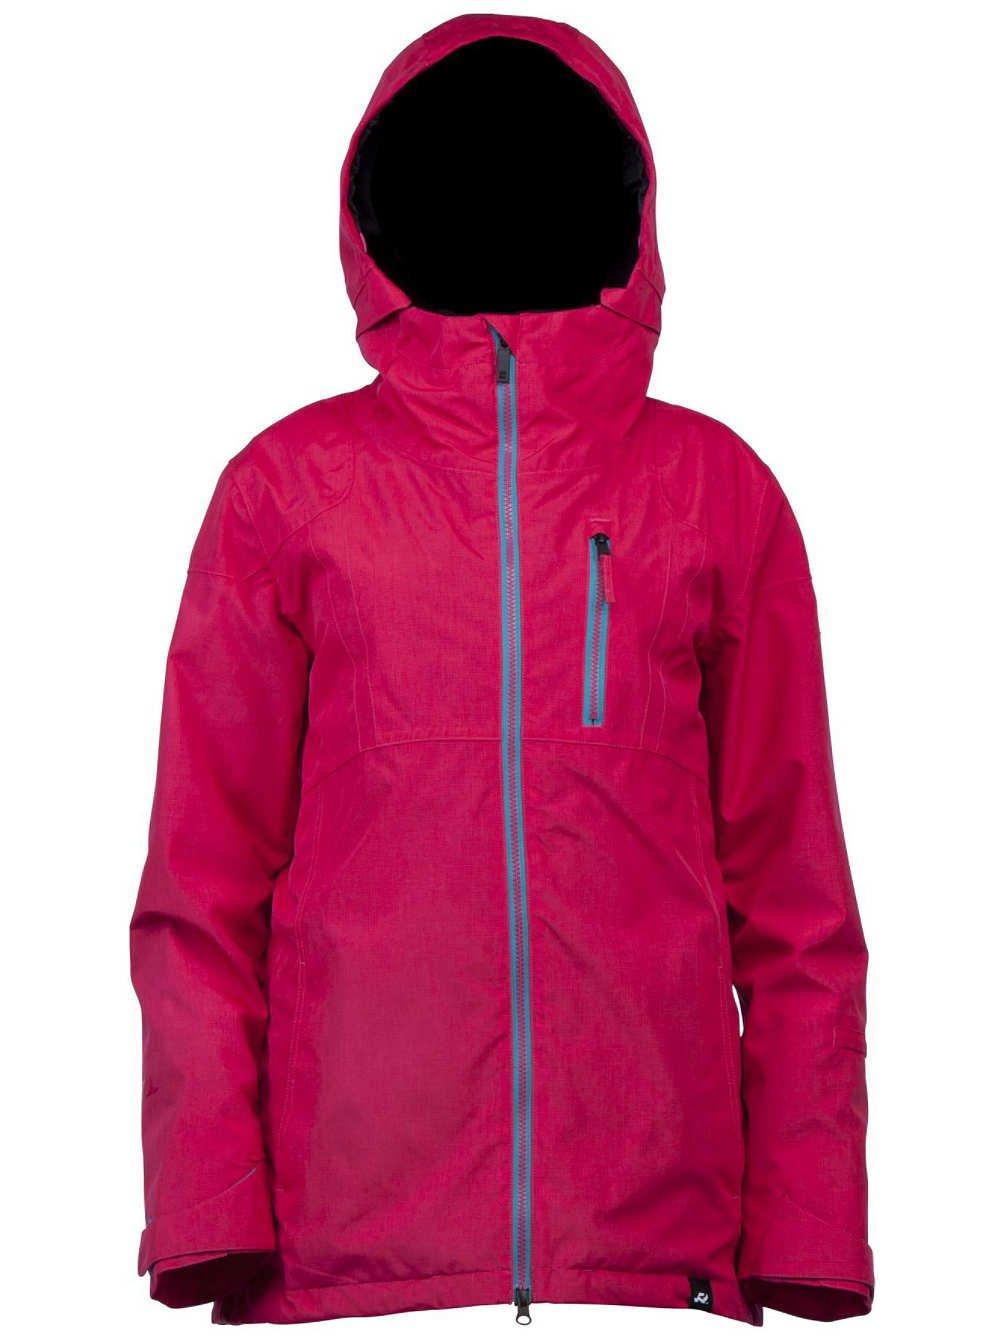 Ride Damen Snowboardjacke Medina Jacket W/Attached Hood jetzt kaufen